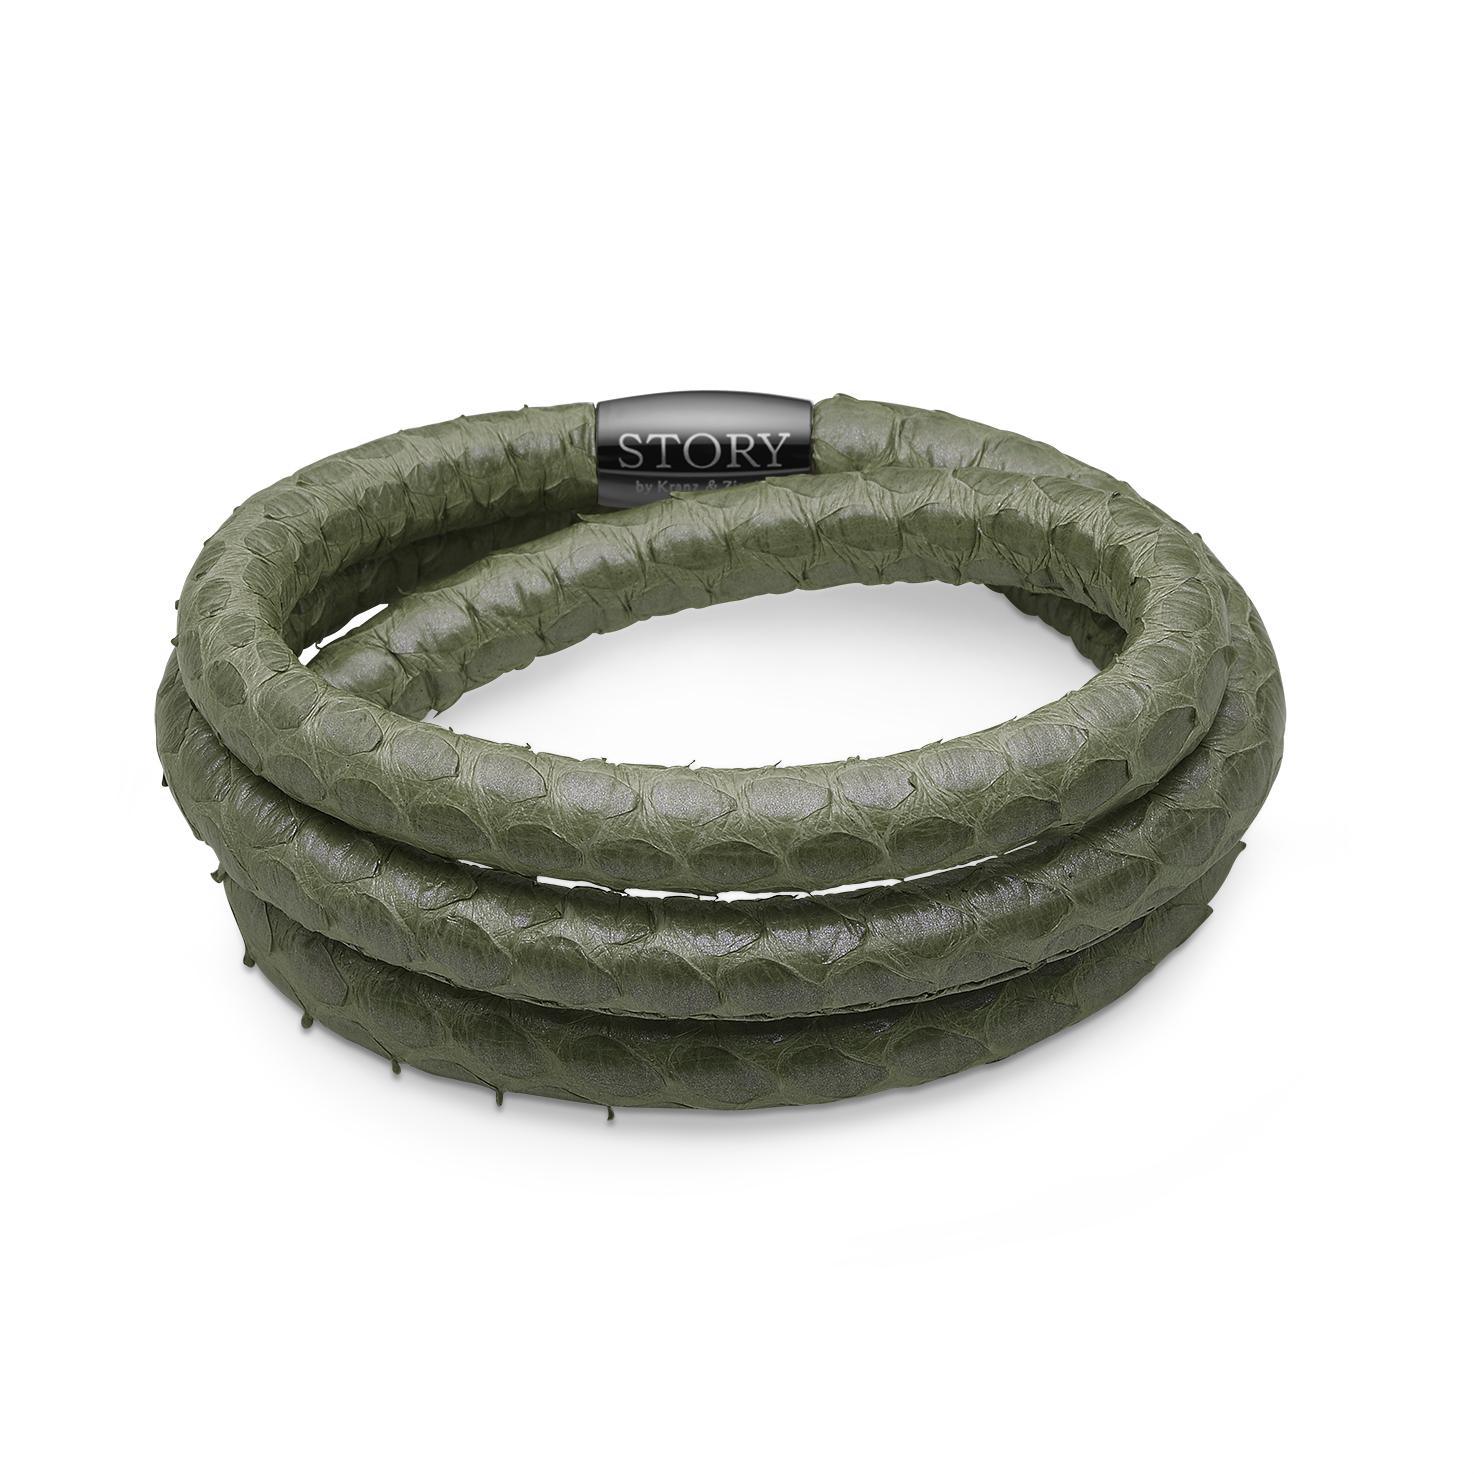 STORY læderarmbånd - 1004869 57 centimeter